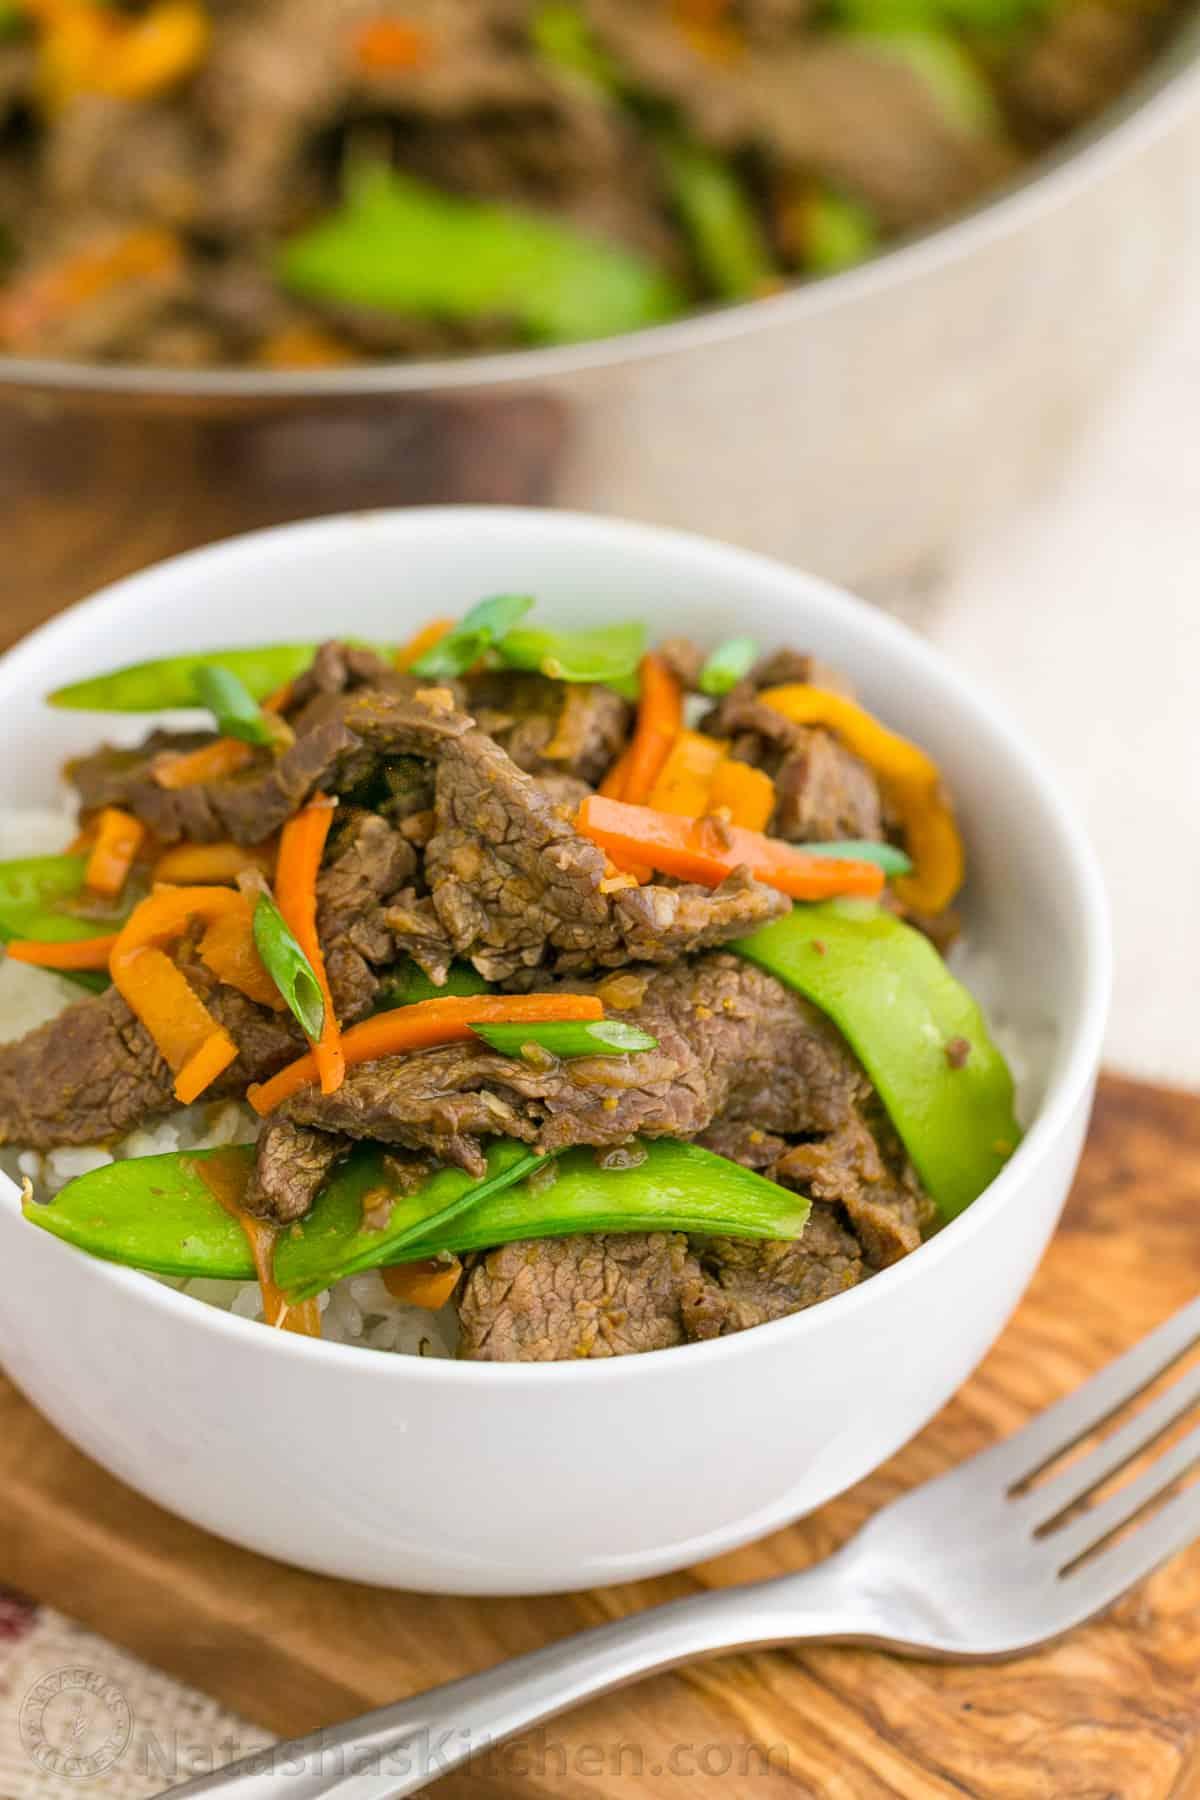 Beef and vegetable stir fry recipe natasha 39 s kitchen for Natashas kitchen